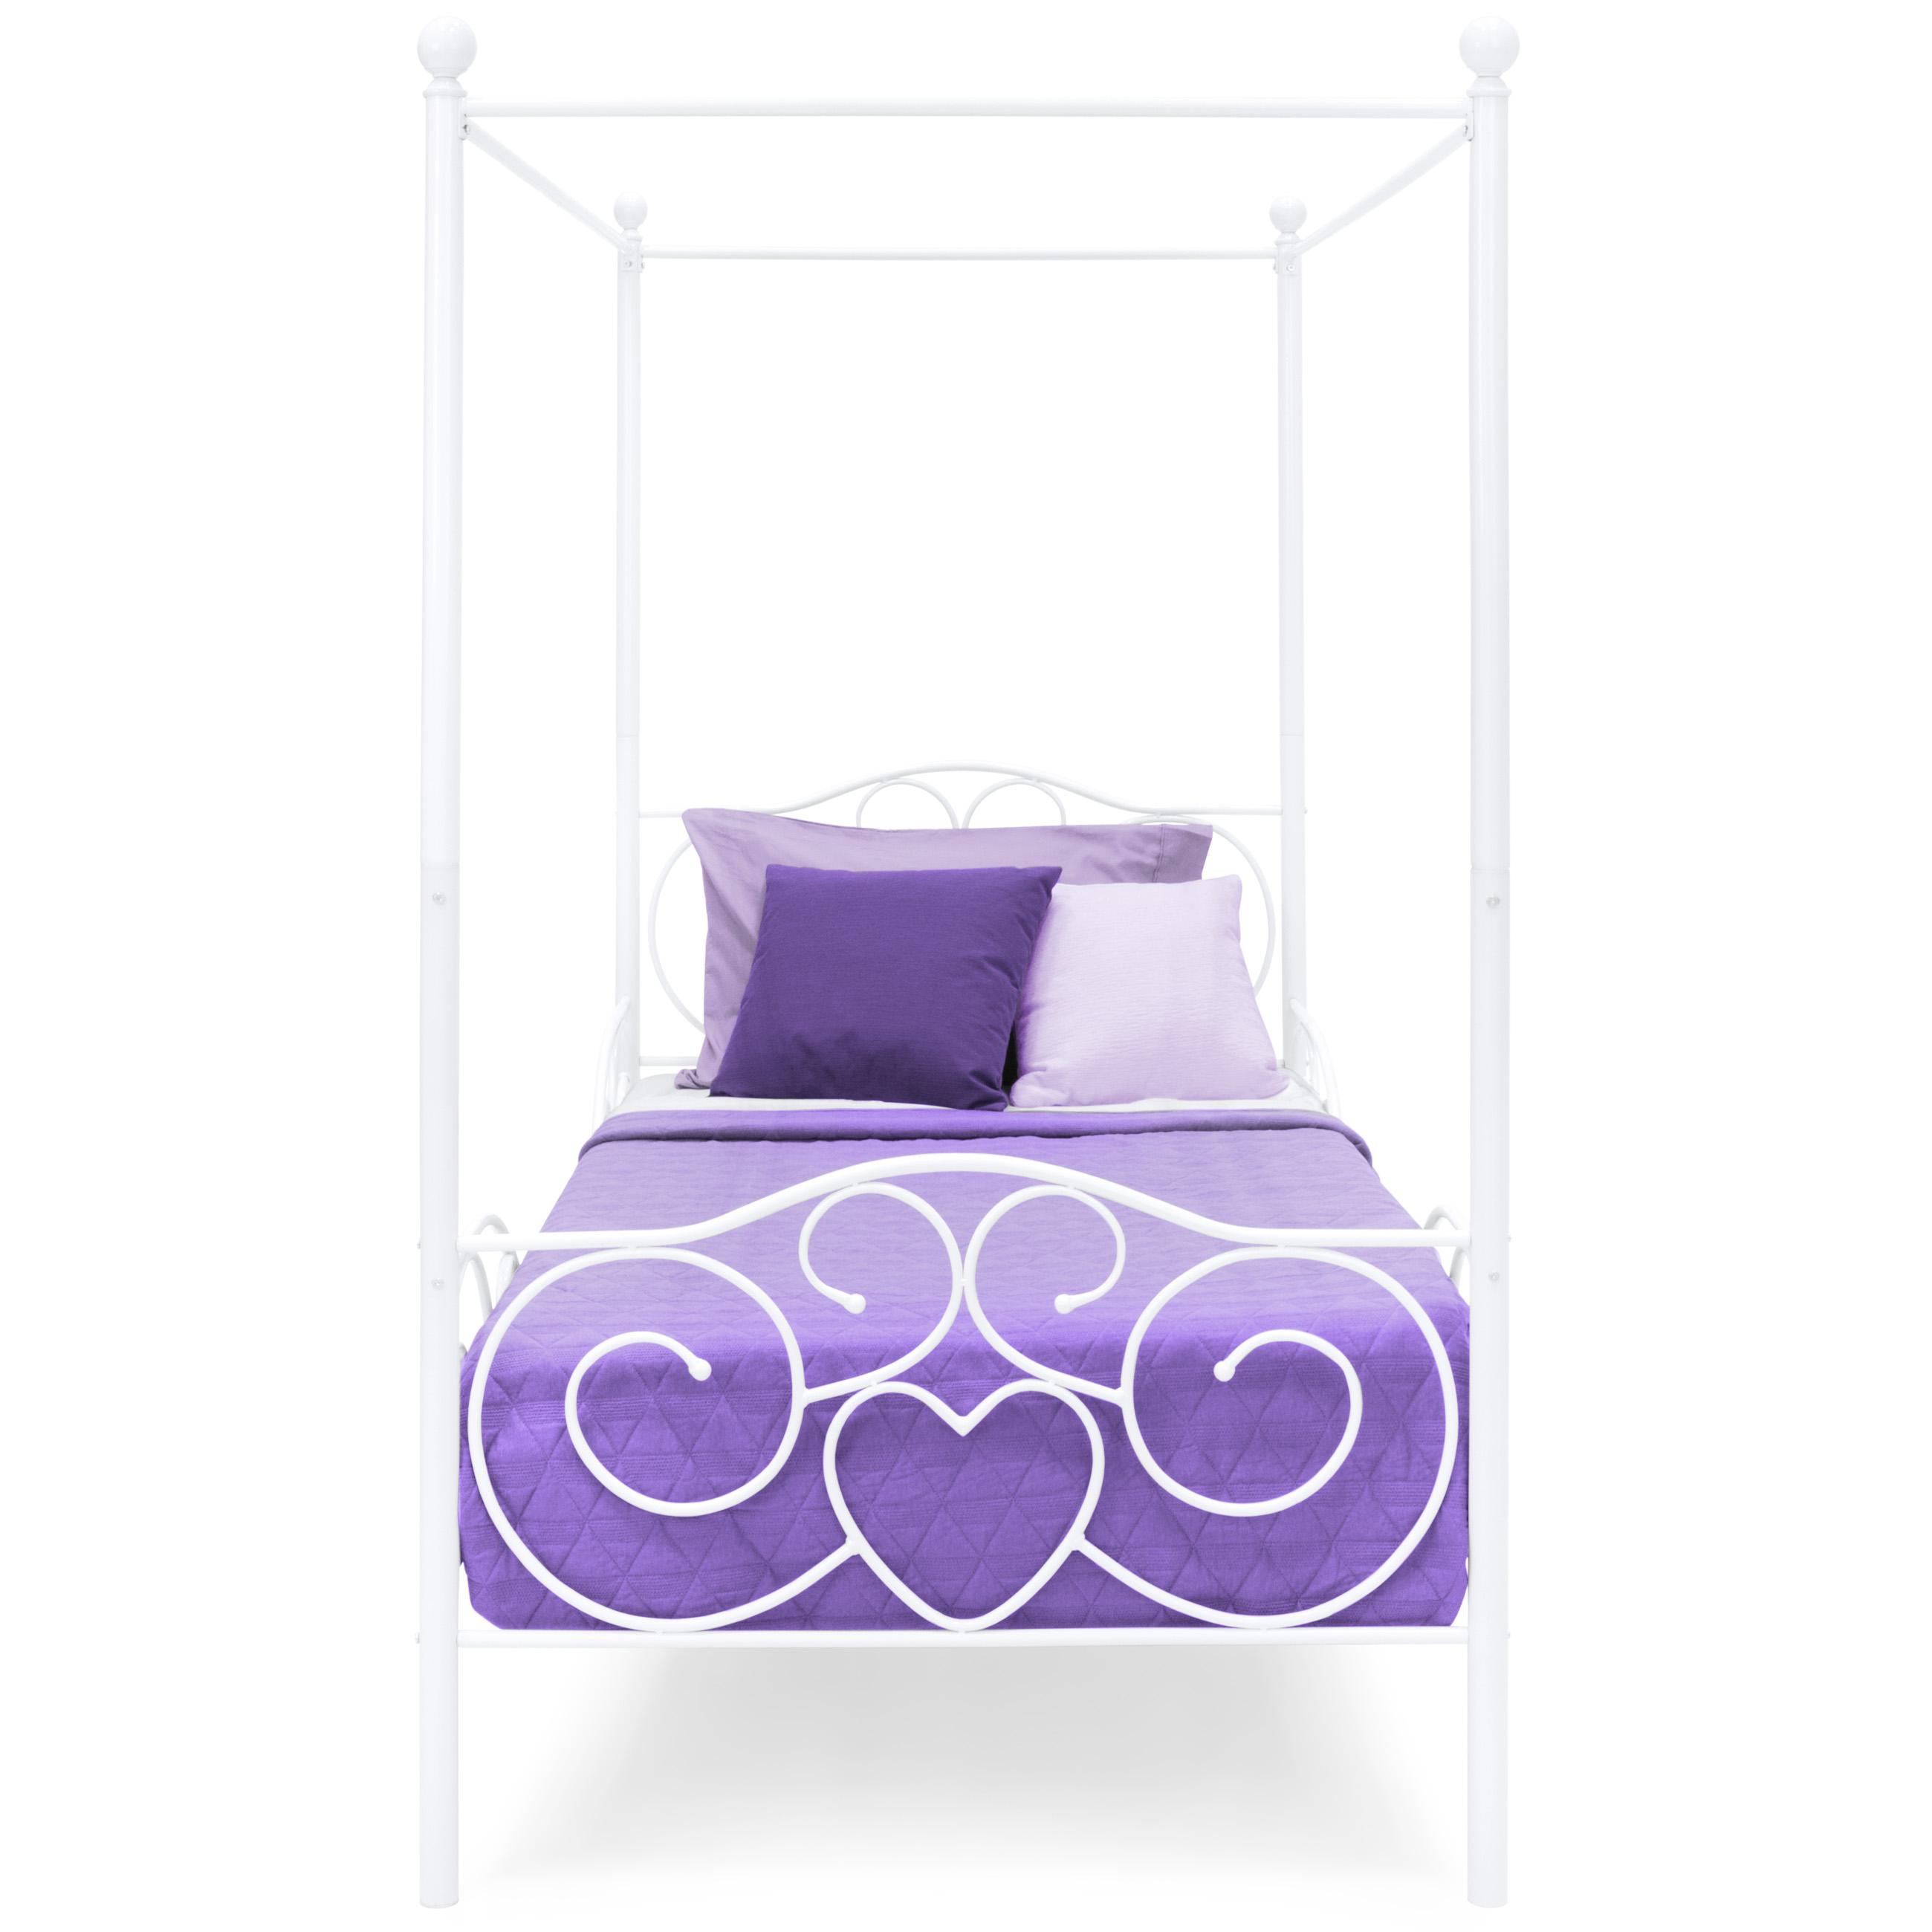 bcp metal canopy twin bed frame w slats white 842957110797 ebay. Black Bedroom Furniture Sets. Home Design Ideas